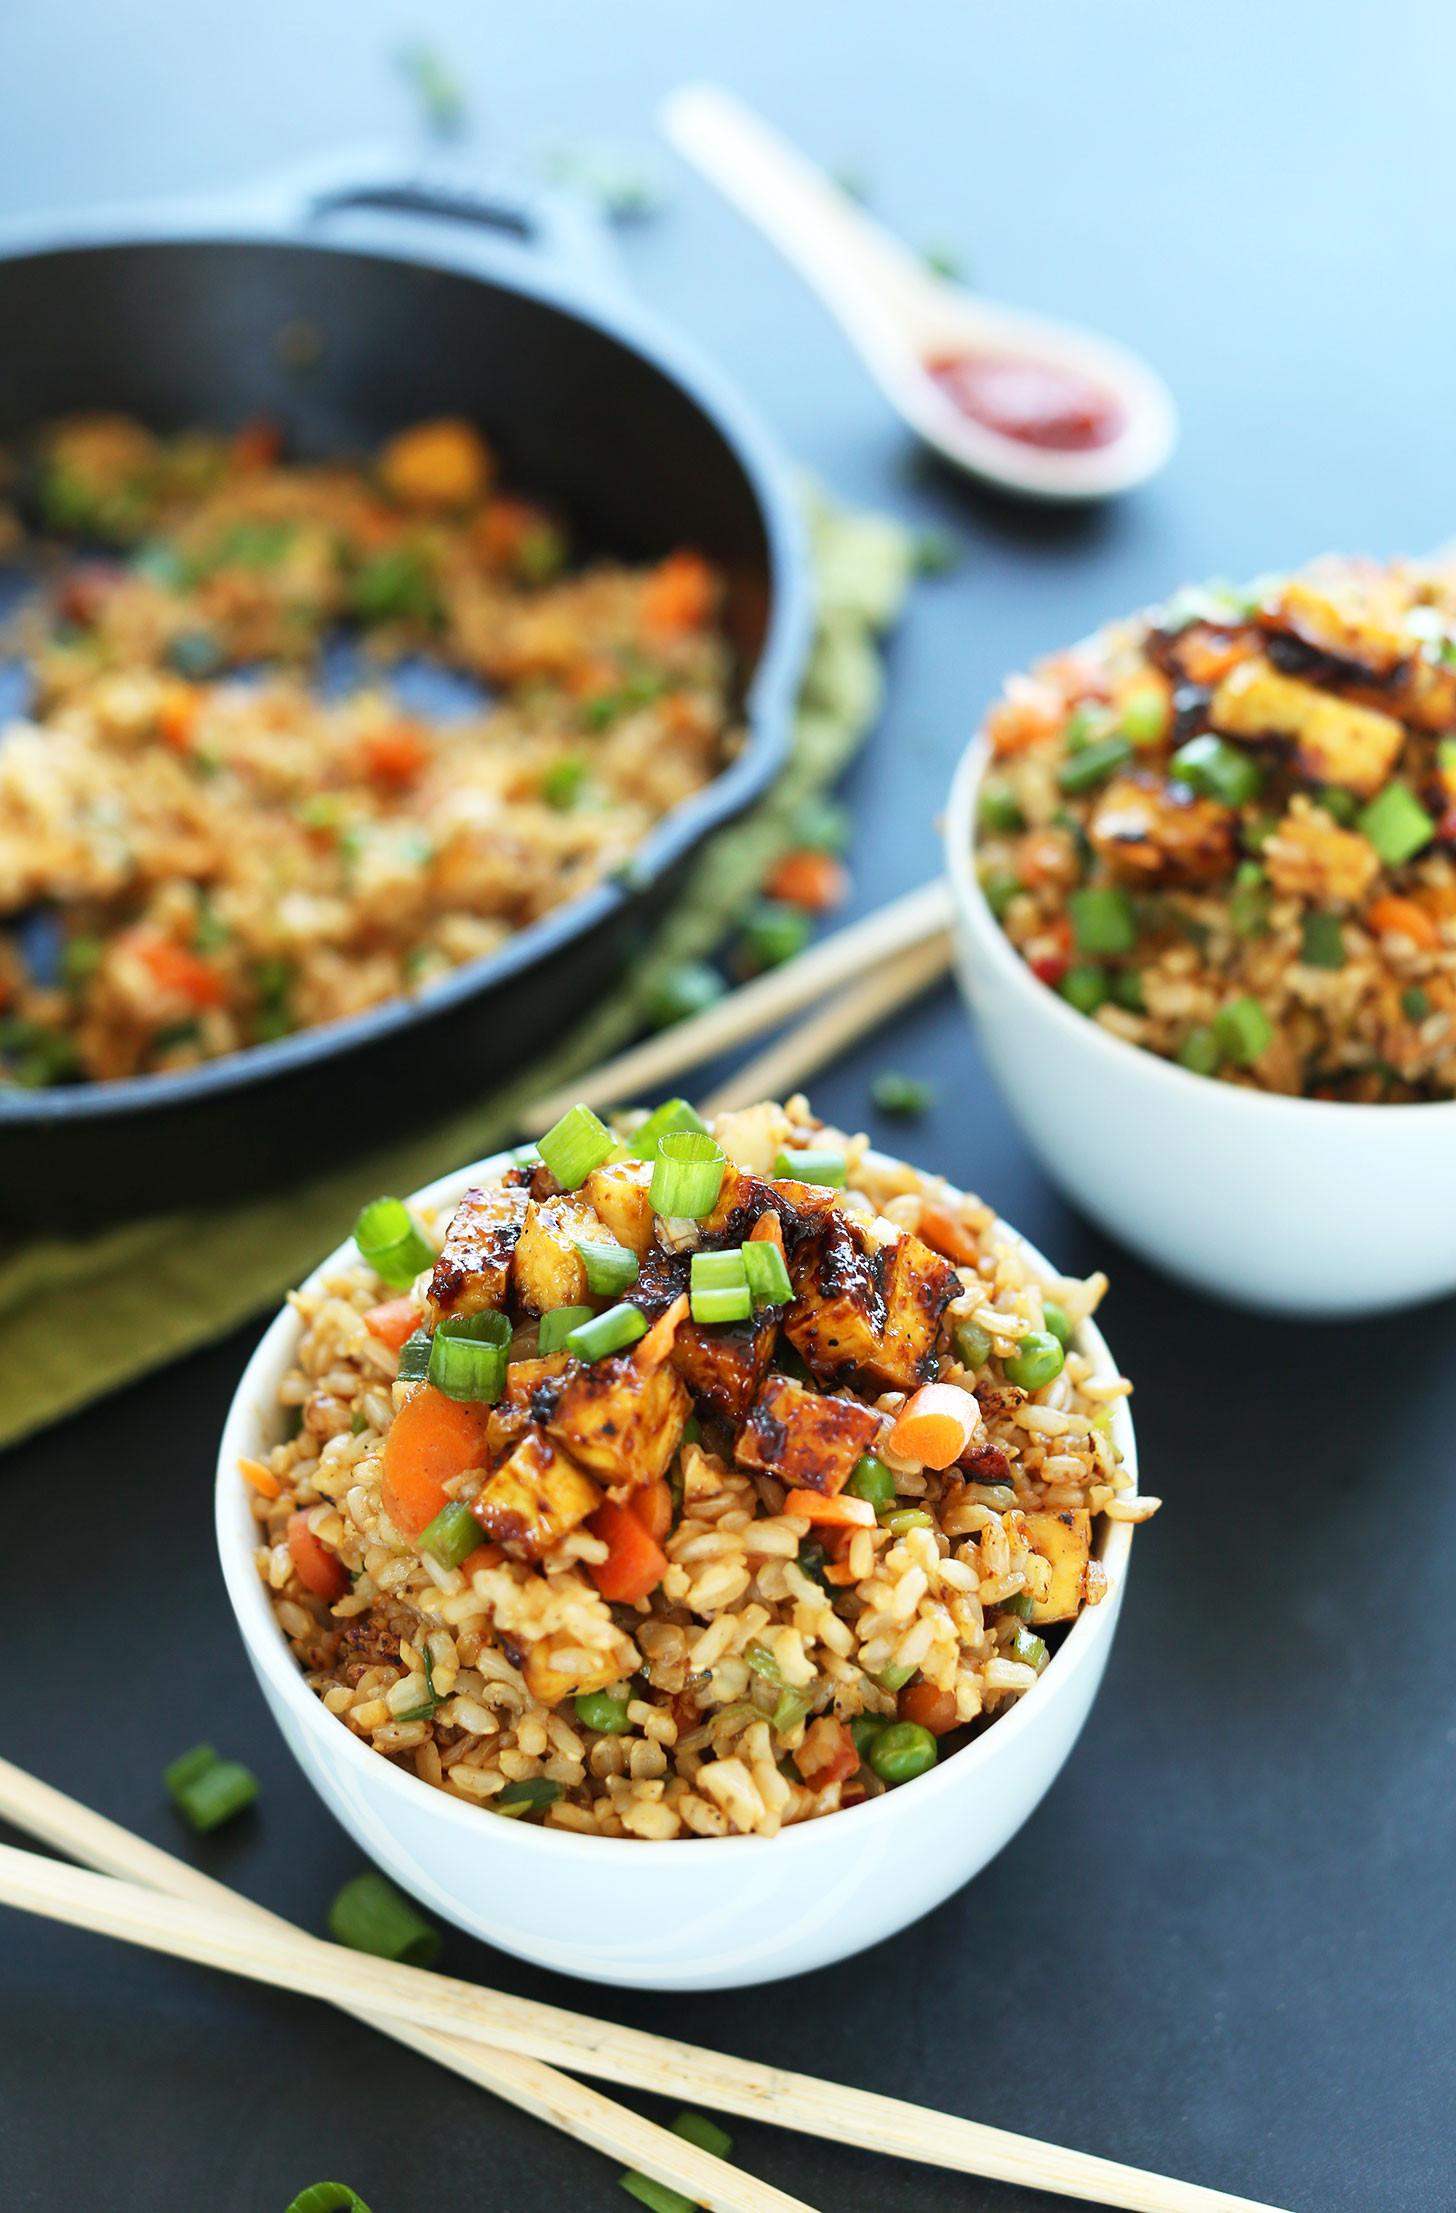 Simple Tofu Recipes  ve arian recipes easy